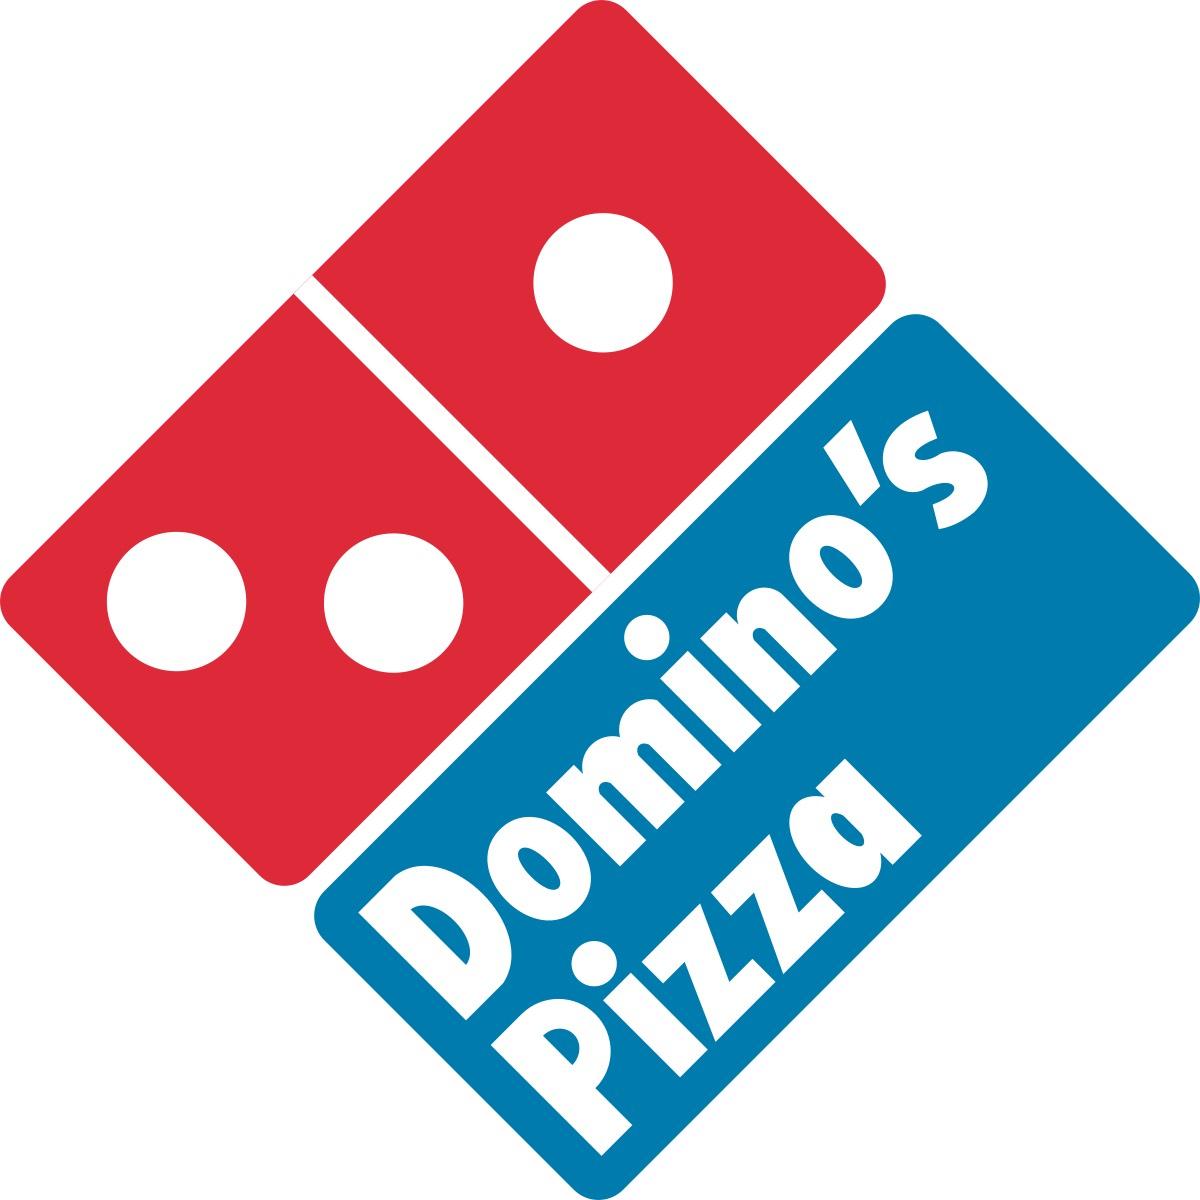 Dominos Pizza: 2. Pizza kostet 2€